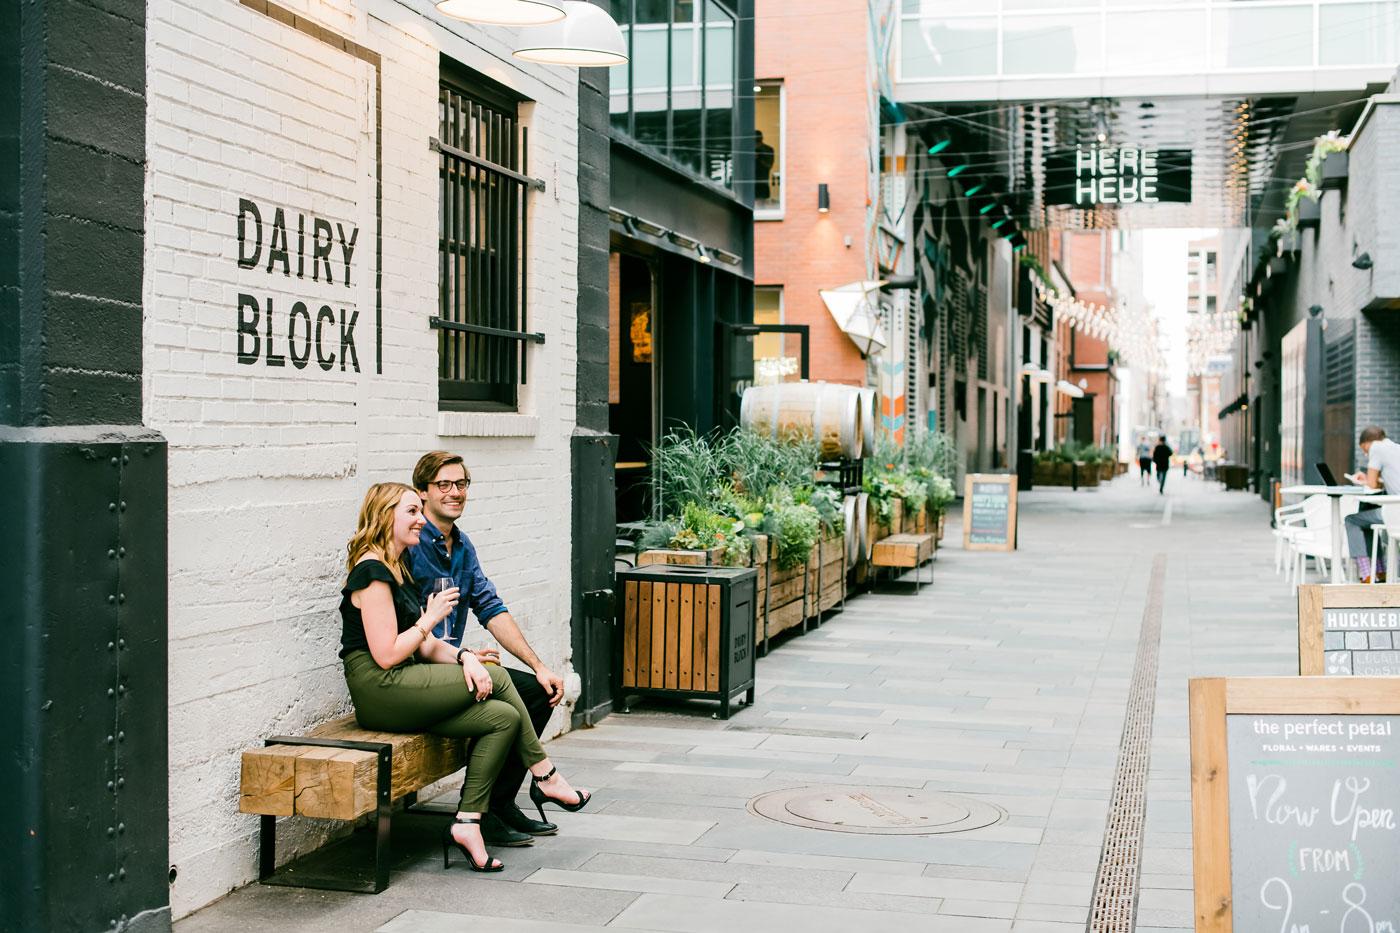 couple enjoying the sites at dairy block denver